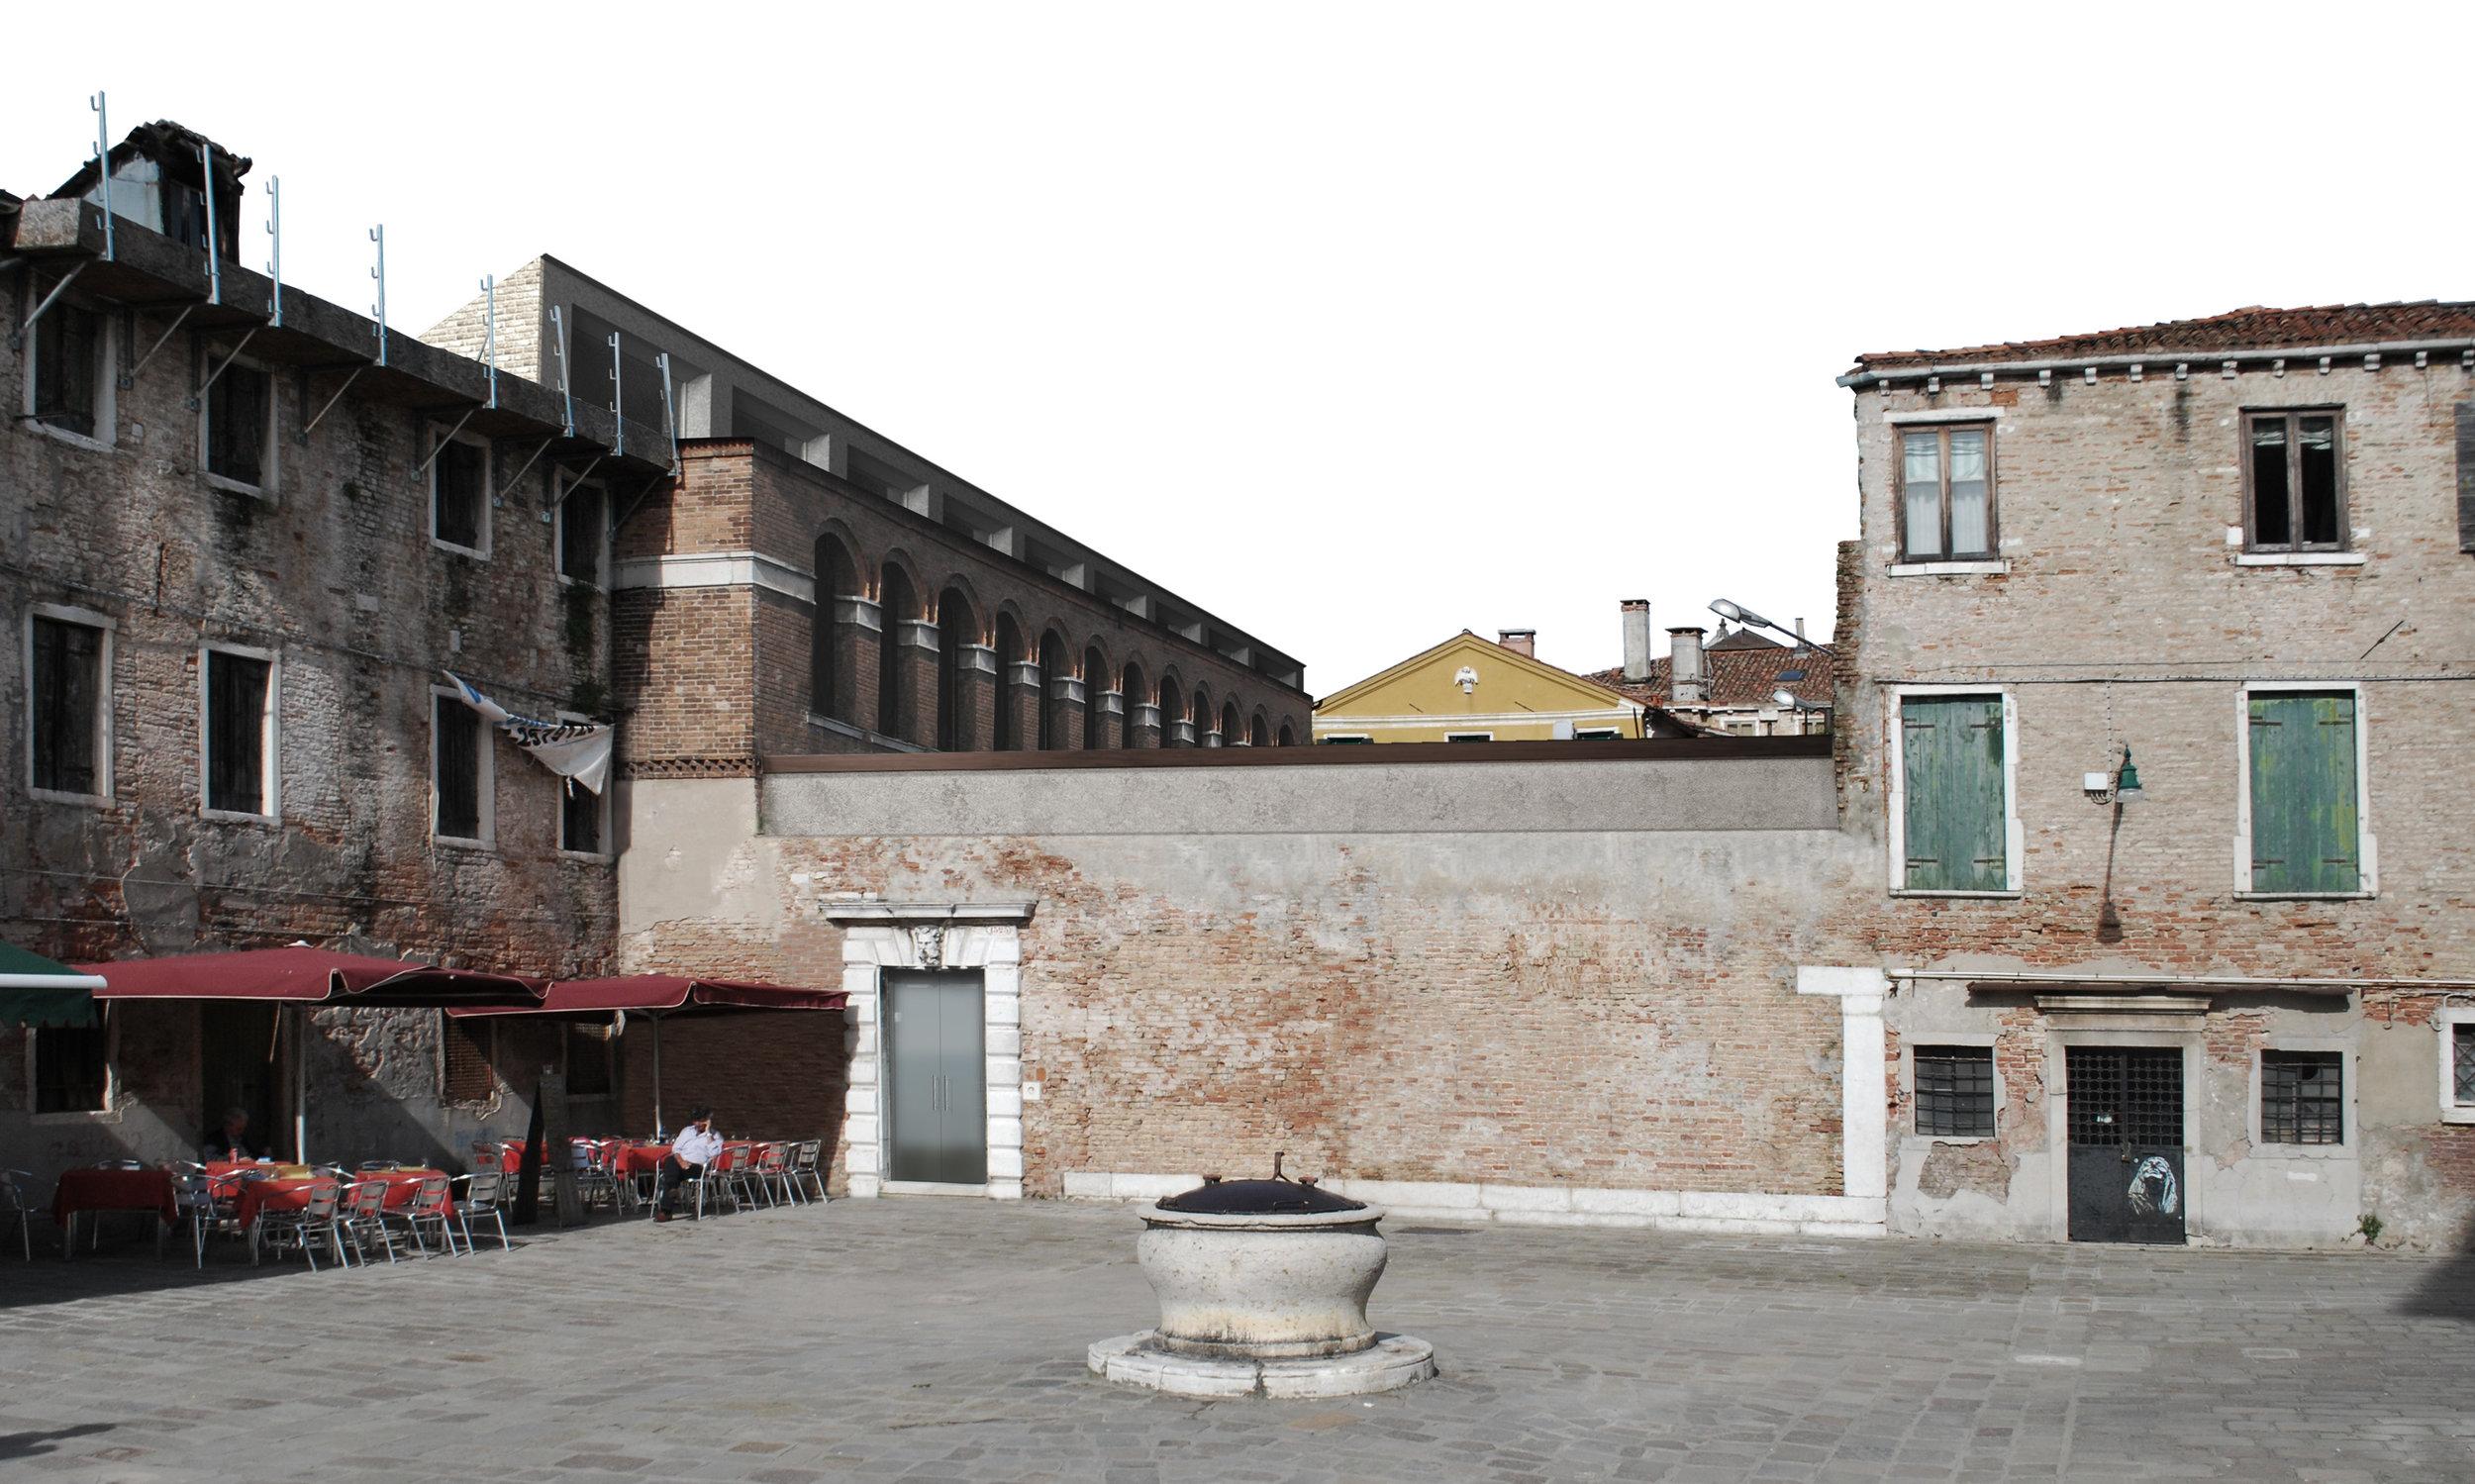 venezia-museo-arte-contemporanea-luce-esterno.jpg